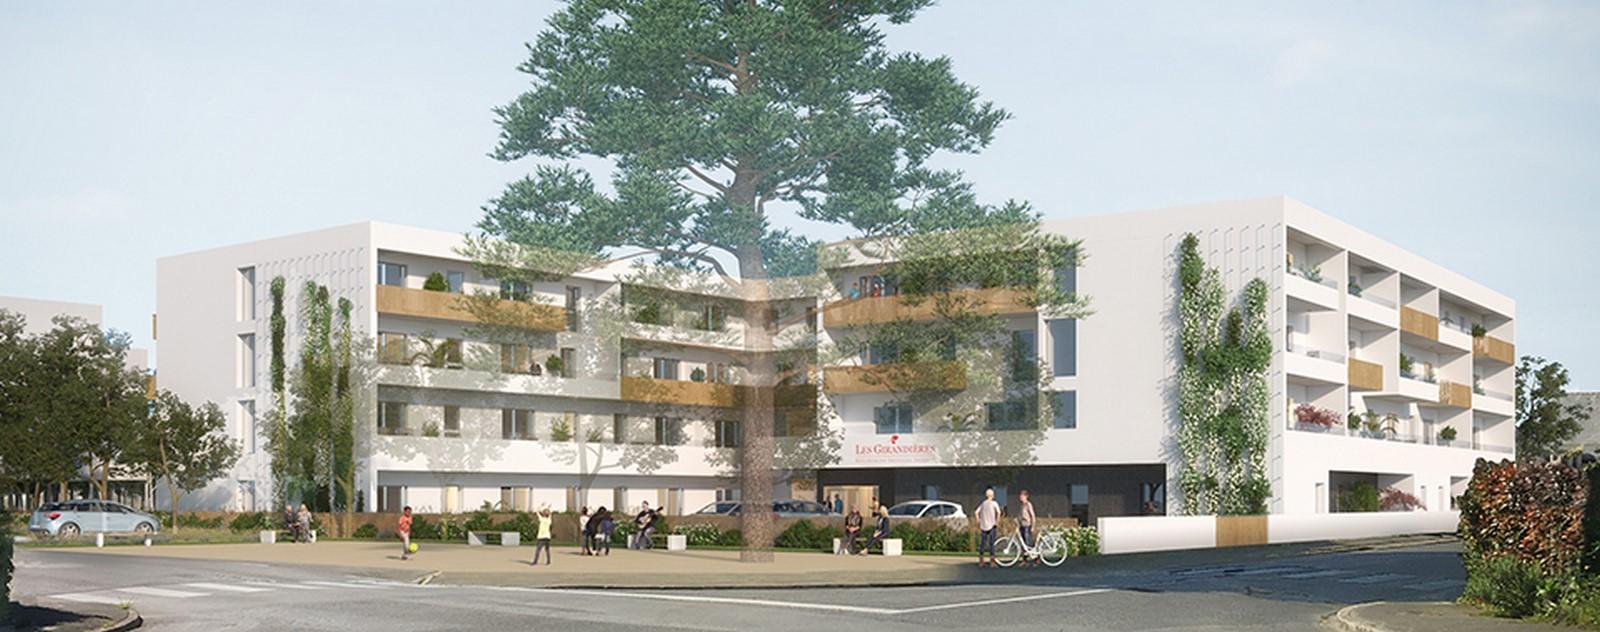 Architects in Brest - Top 30 Architects in Brest - Sheet6